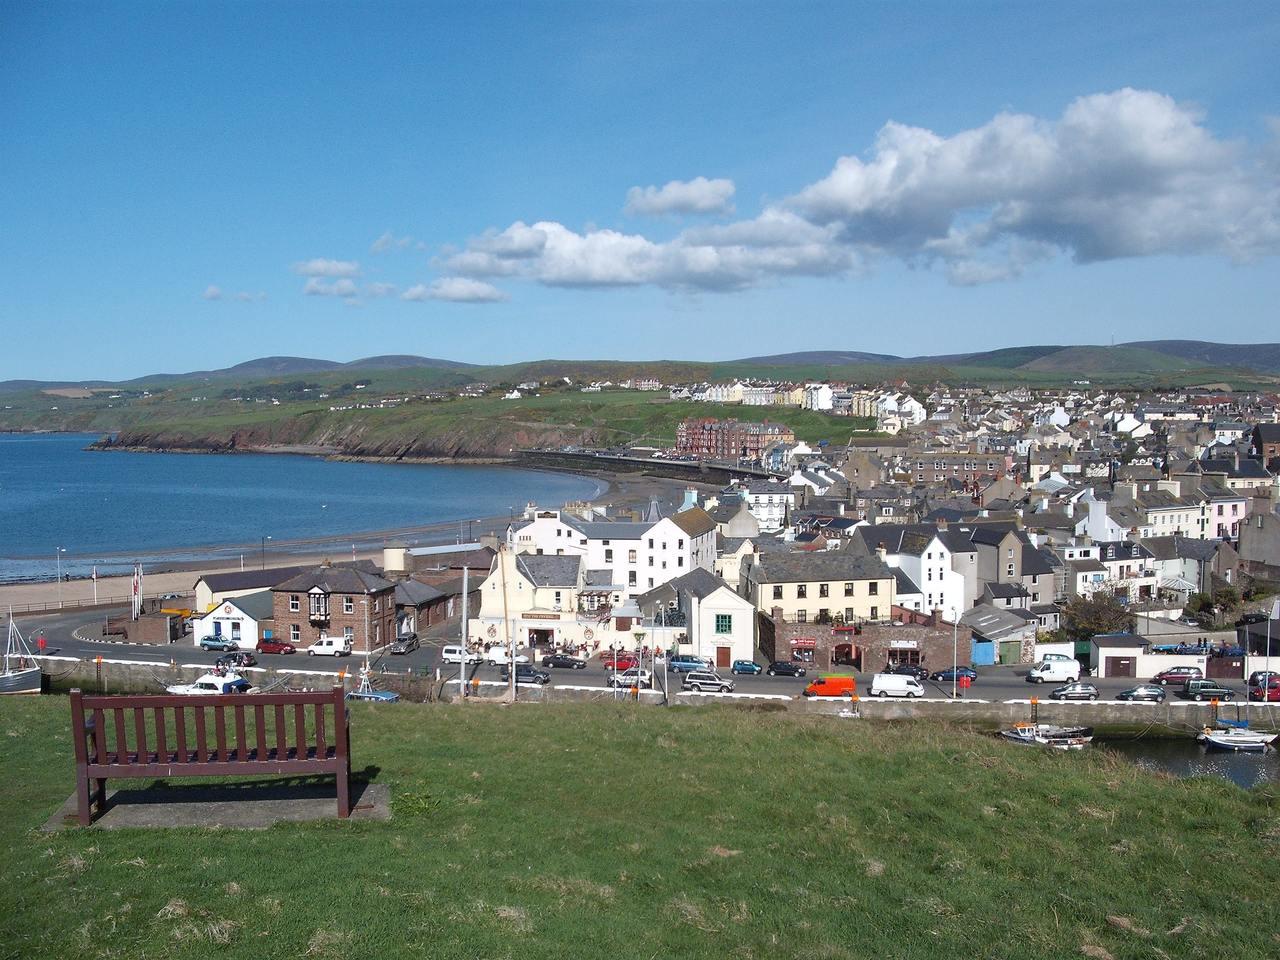 10 Good Reasons to Visit the Isle of Man